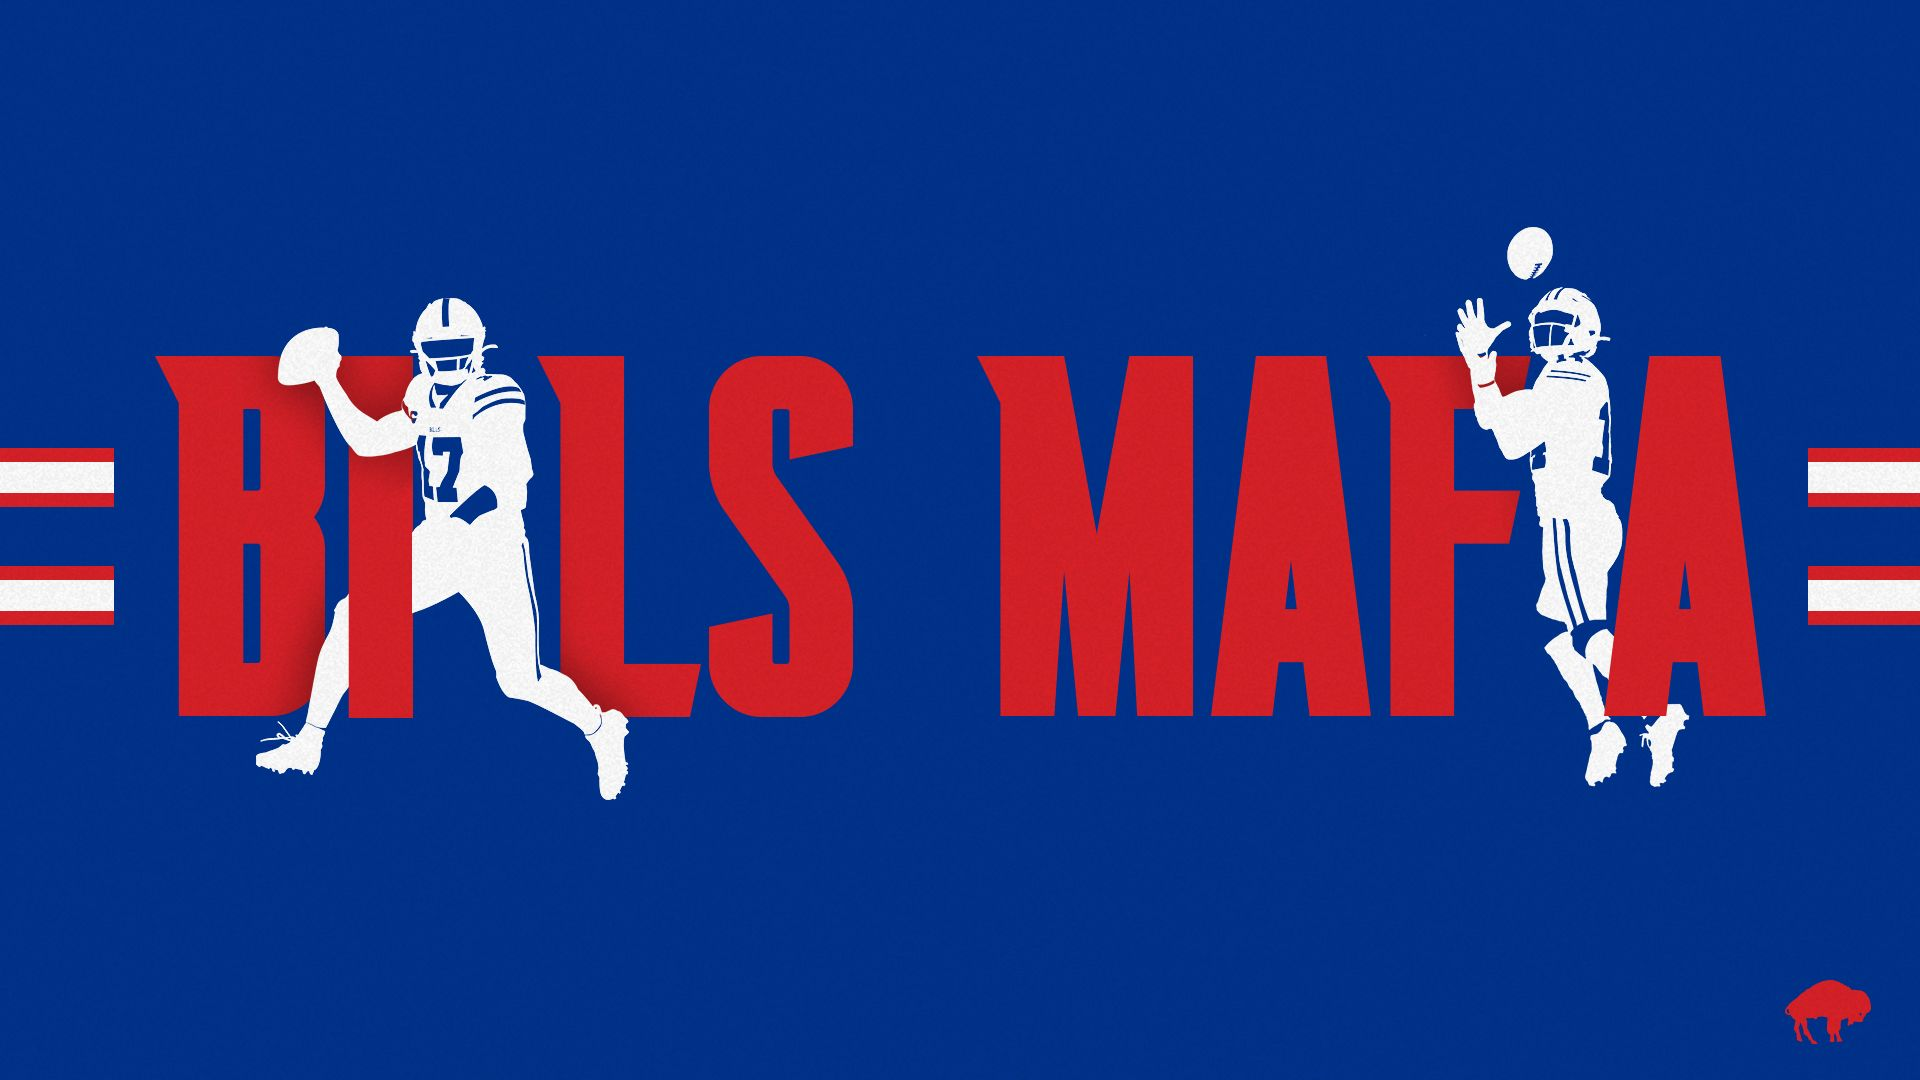 Buffalo Bills Wallpapers Buffalo Bills Buffalobills Com